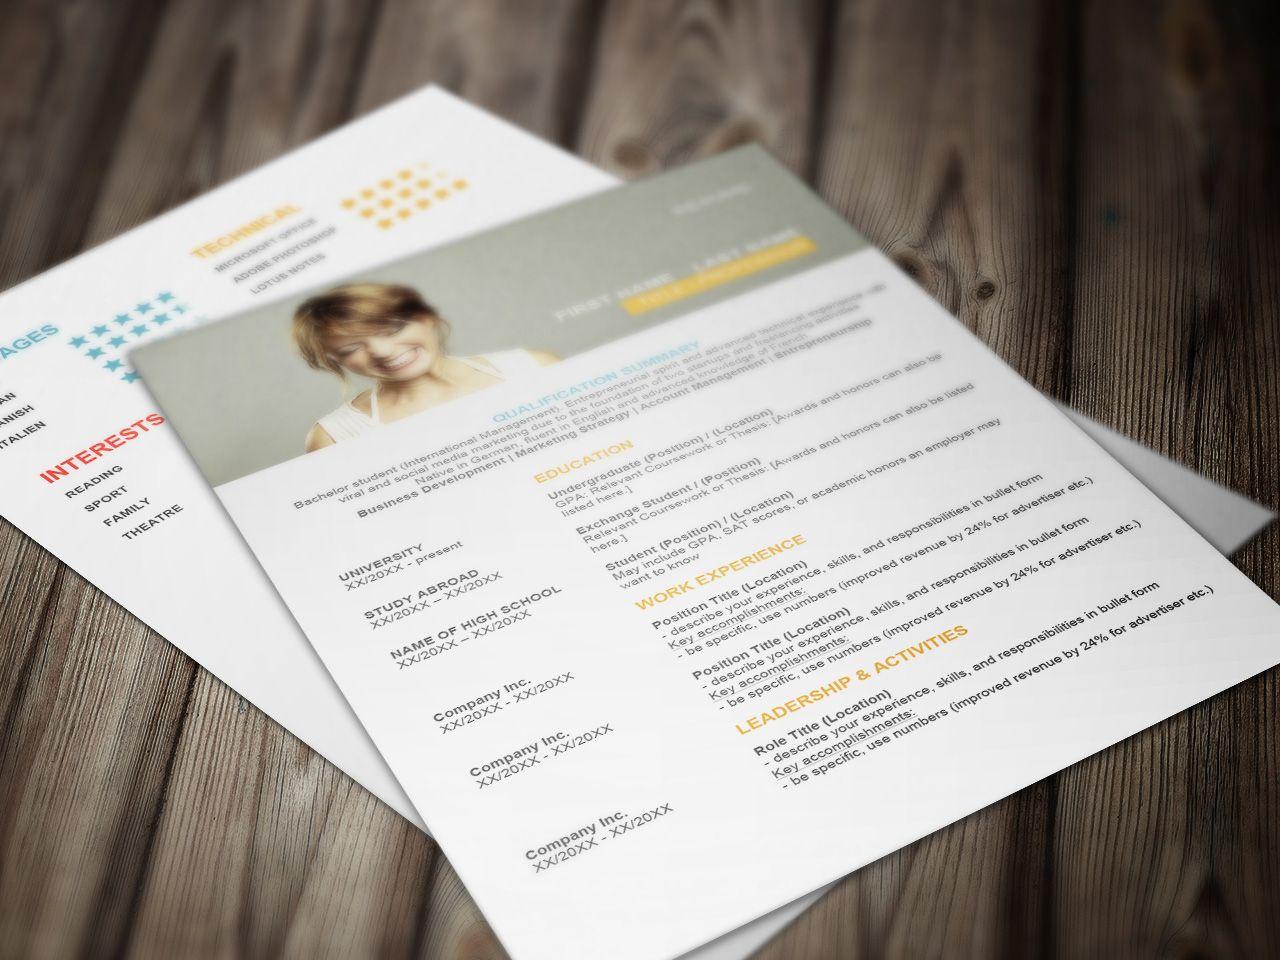 Resume Template Word ▶▶▶ Ready for Microsoft® Word ▶▶▶ 100% Customizable ▶▶▶ Safe with Harvard Standards #jobinterview #jobapplication #parttimejob #firstjob #internship #jobhunting #career #cv #resume #hiring #iquitmyjob #quitmyjob #curriculumvitae #jobhunt #jobsearch #applicationform #wearehiring #recruiting #coverletter #coversheet #goodypatterns #resume #template #word